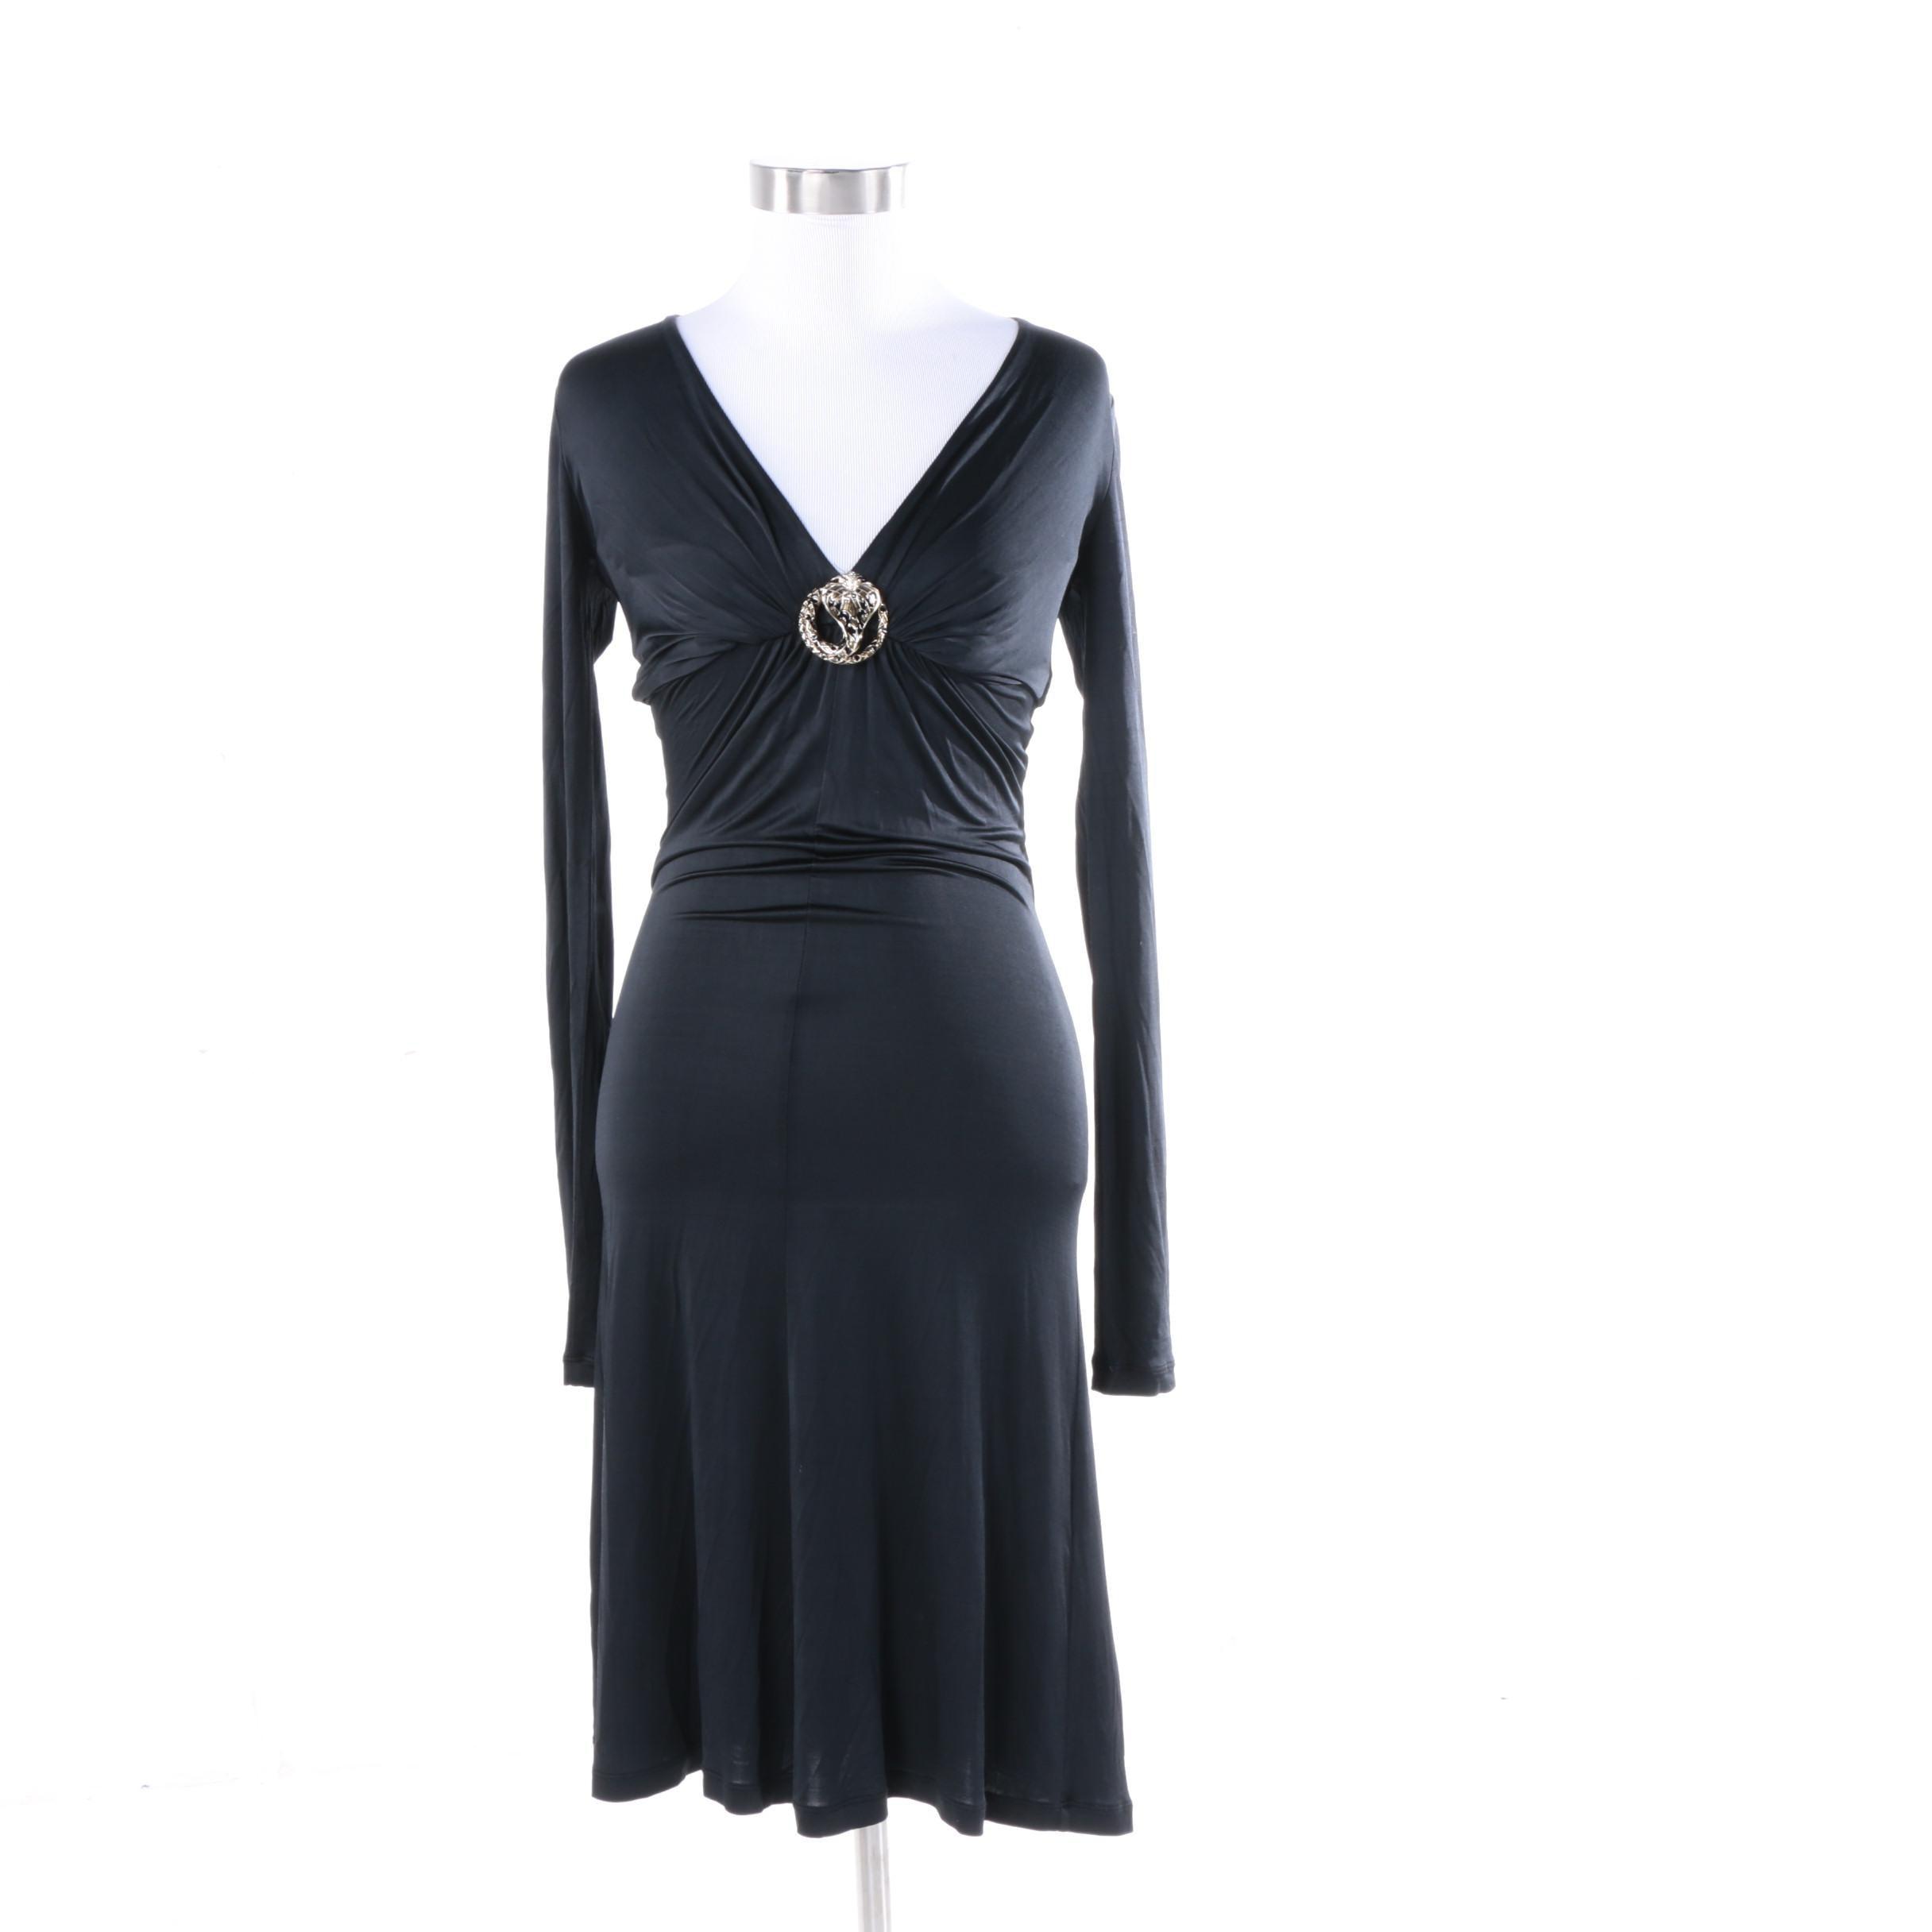 Roberto Cavalli Black Viscose Cocktail Dress